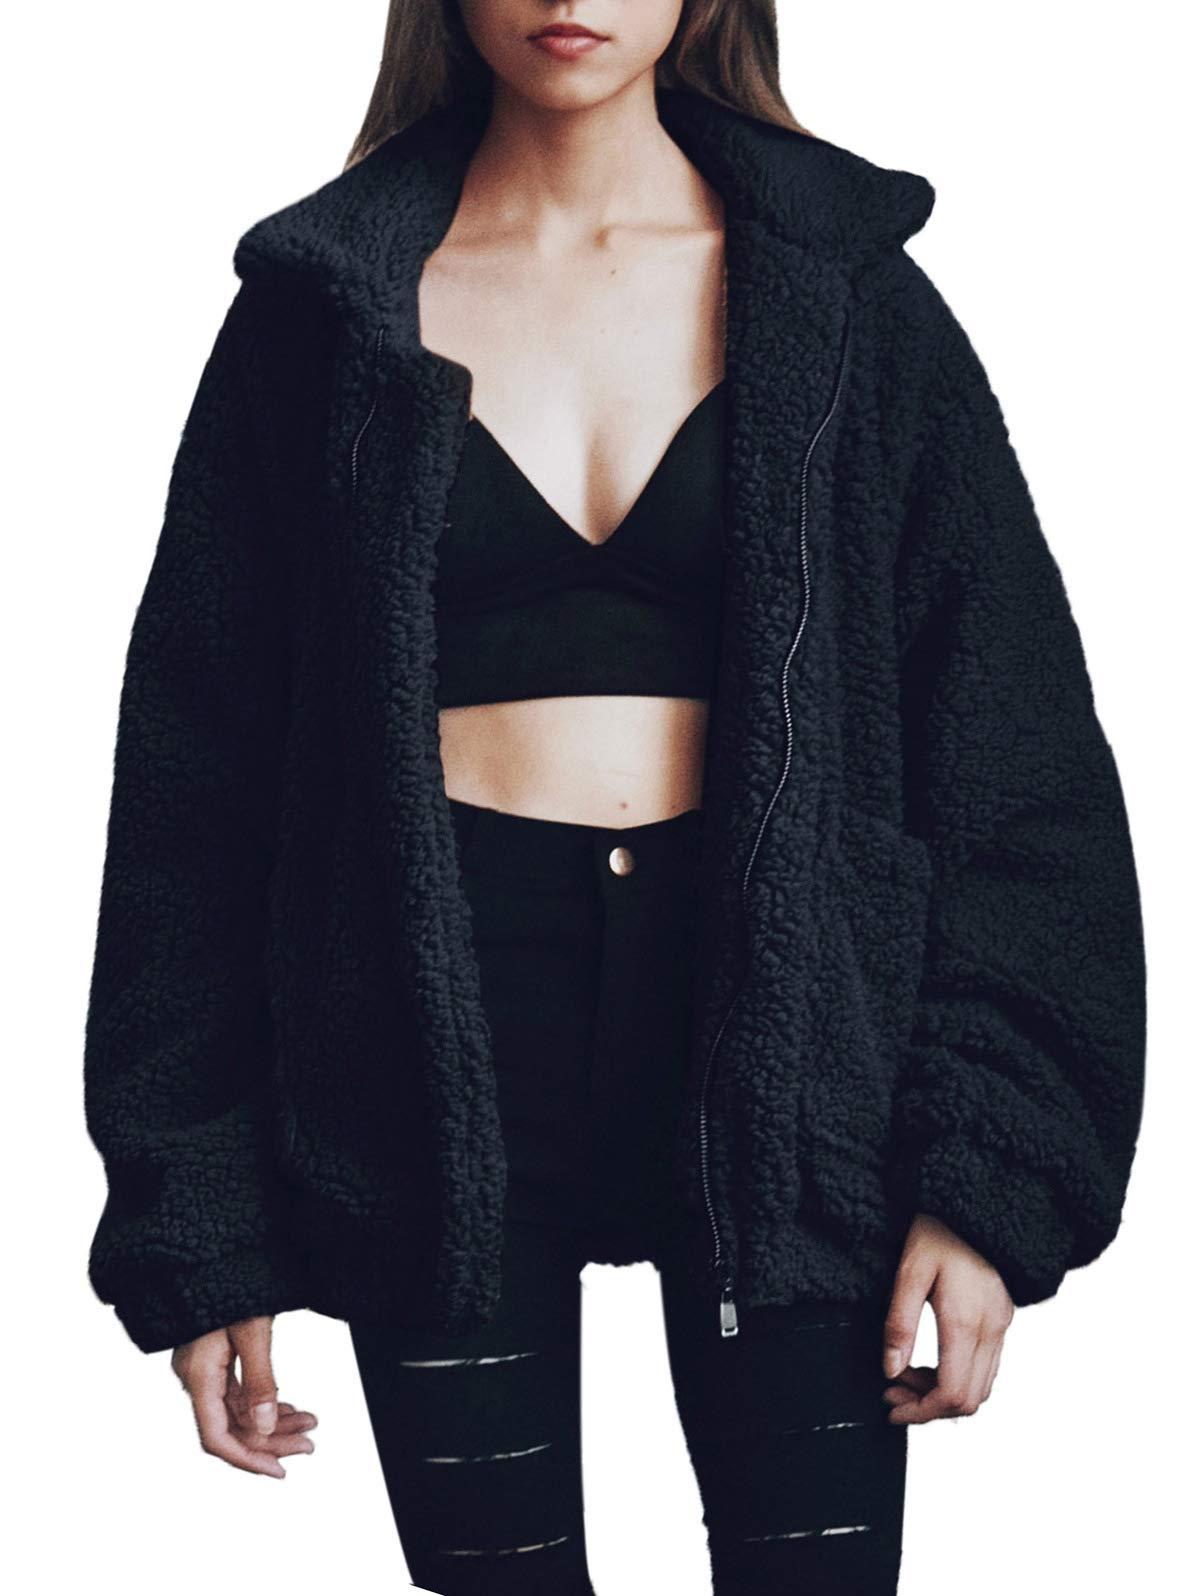 SHIBEVER Fluffy Women Coats Faux Wool Blend Warm Winter Jacket Zip Up Long Sleeve Oversized Fashion Outerwear